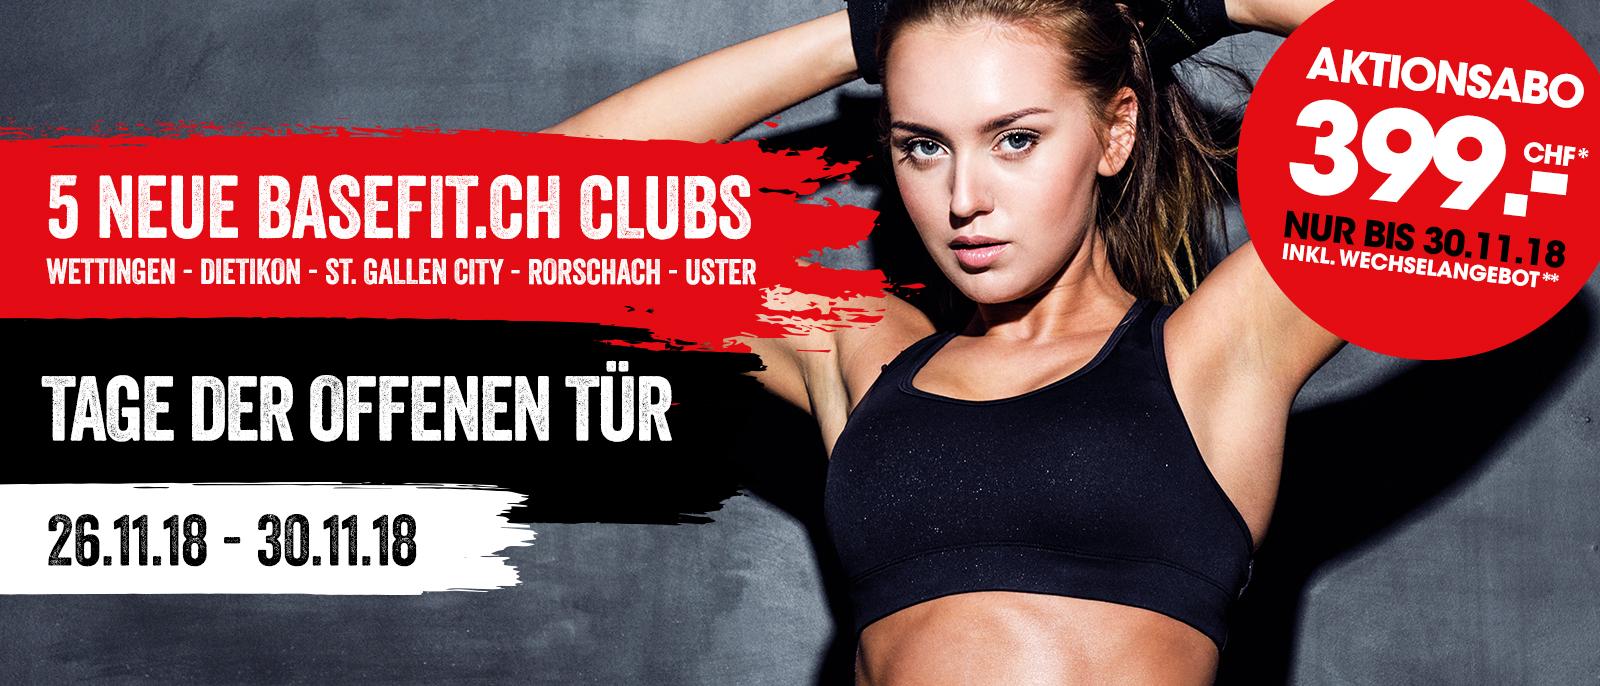 5 neue basefit.ch Clubs November